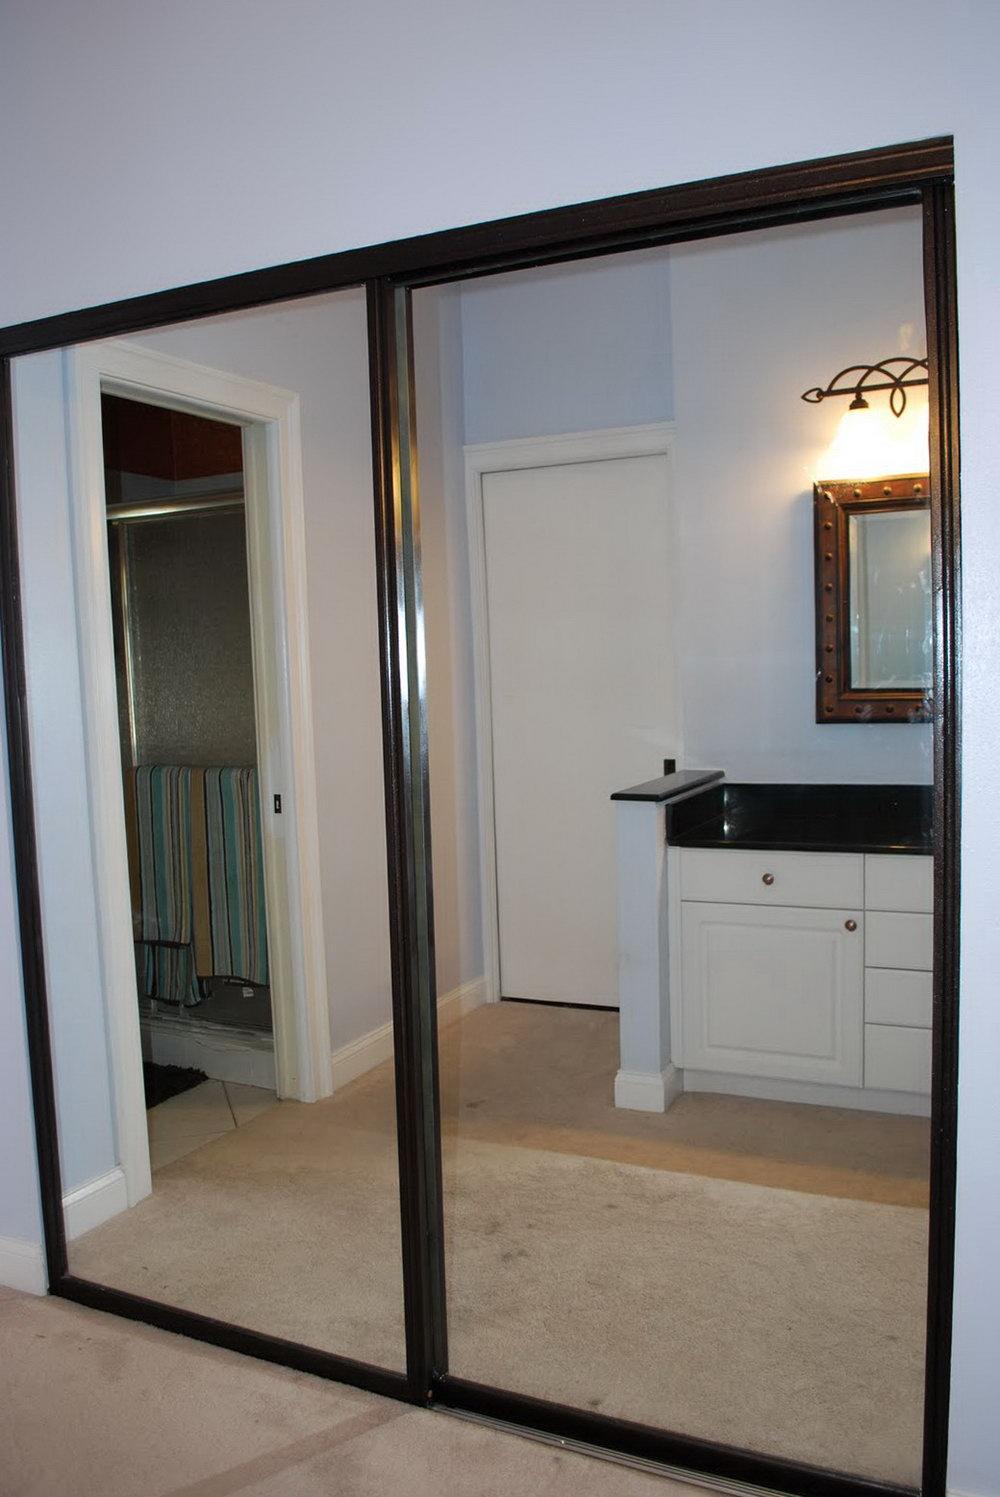 mirrored closet doors menards photo - 1